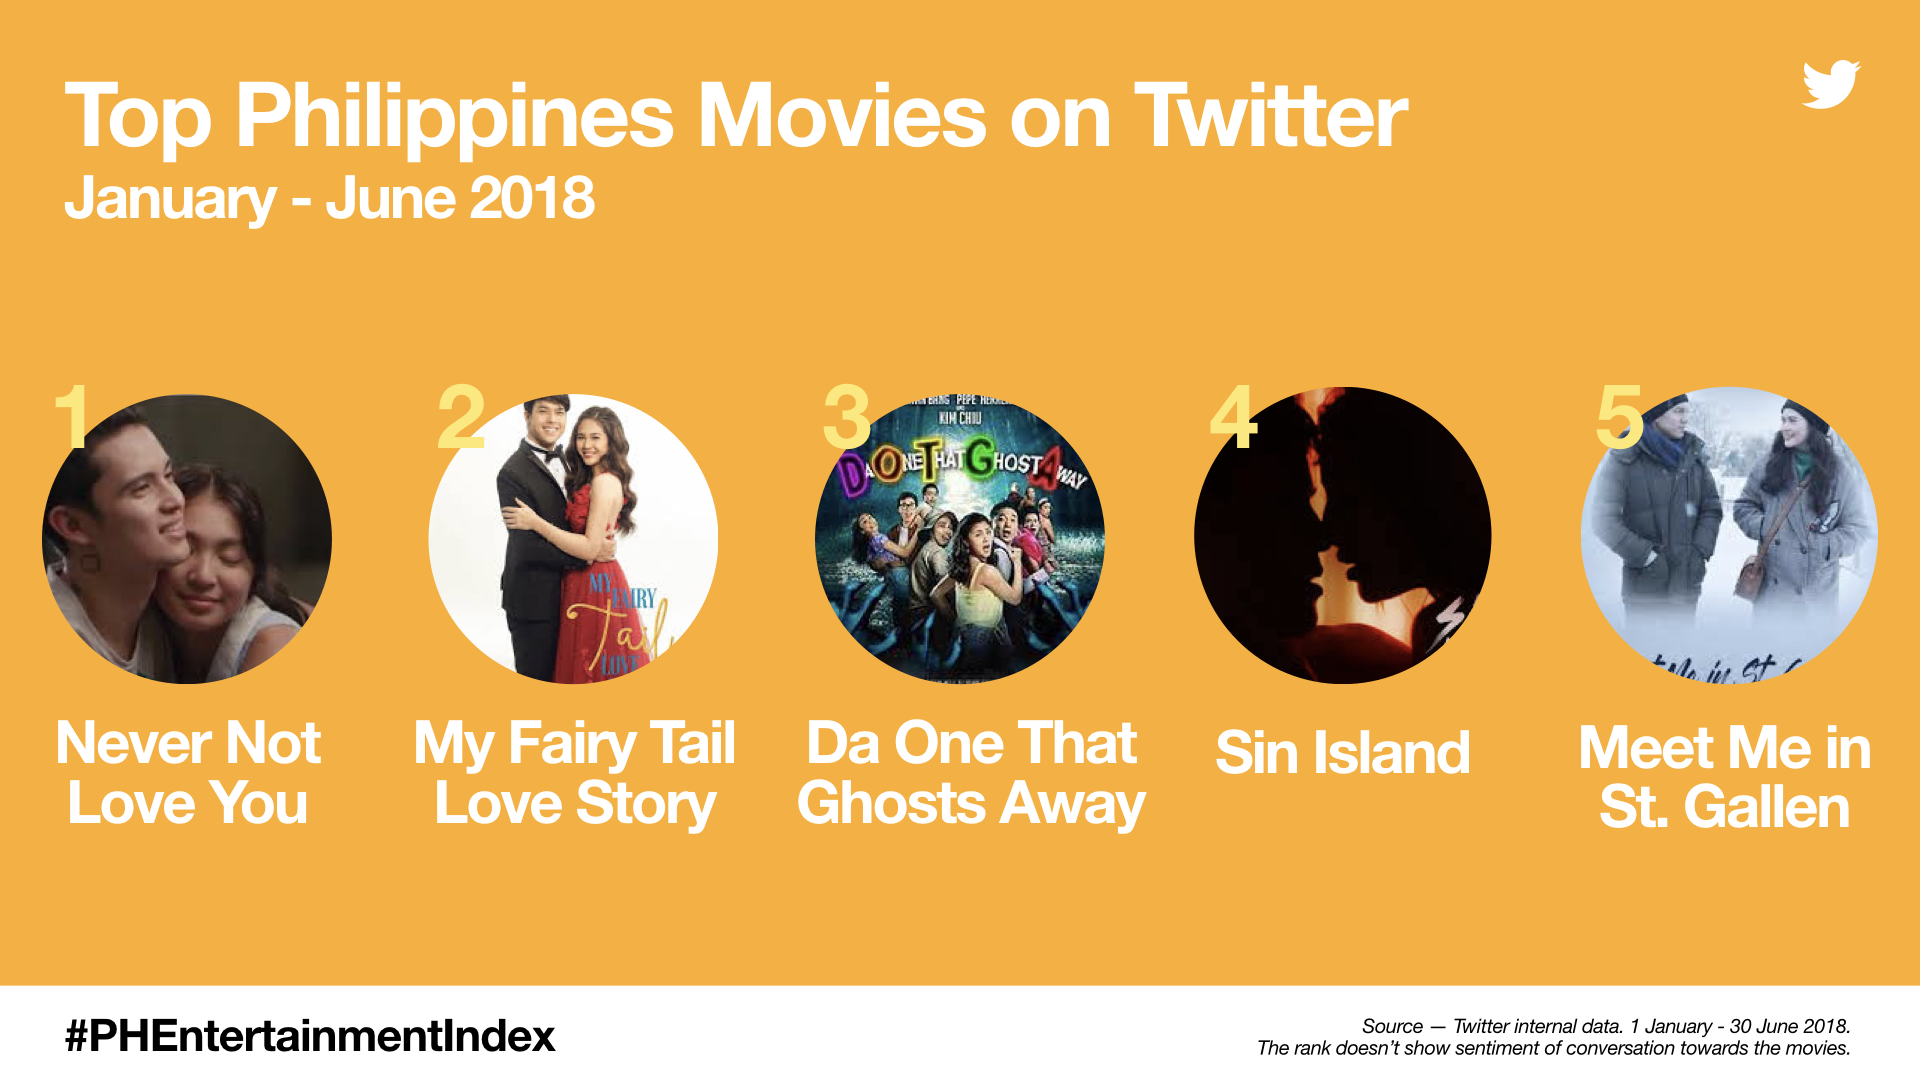 PH Entertainment Index - Top Philippines Movies (Jan-June 2018)